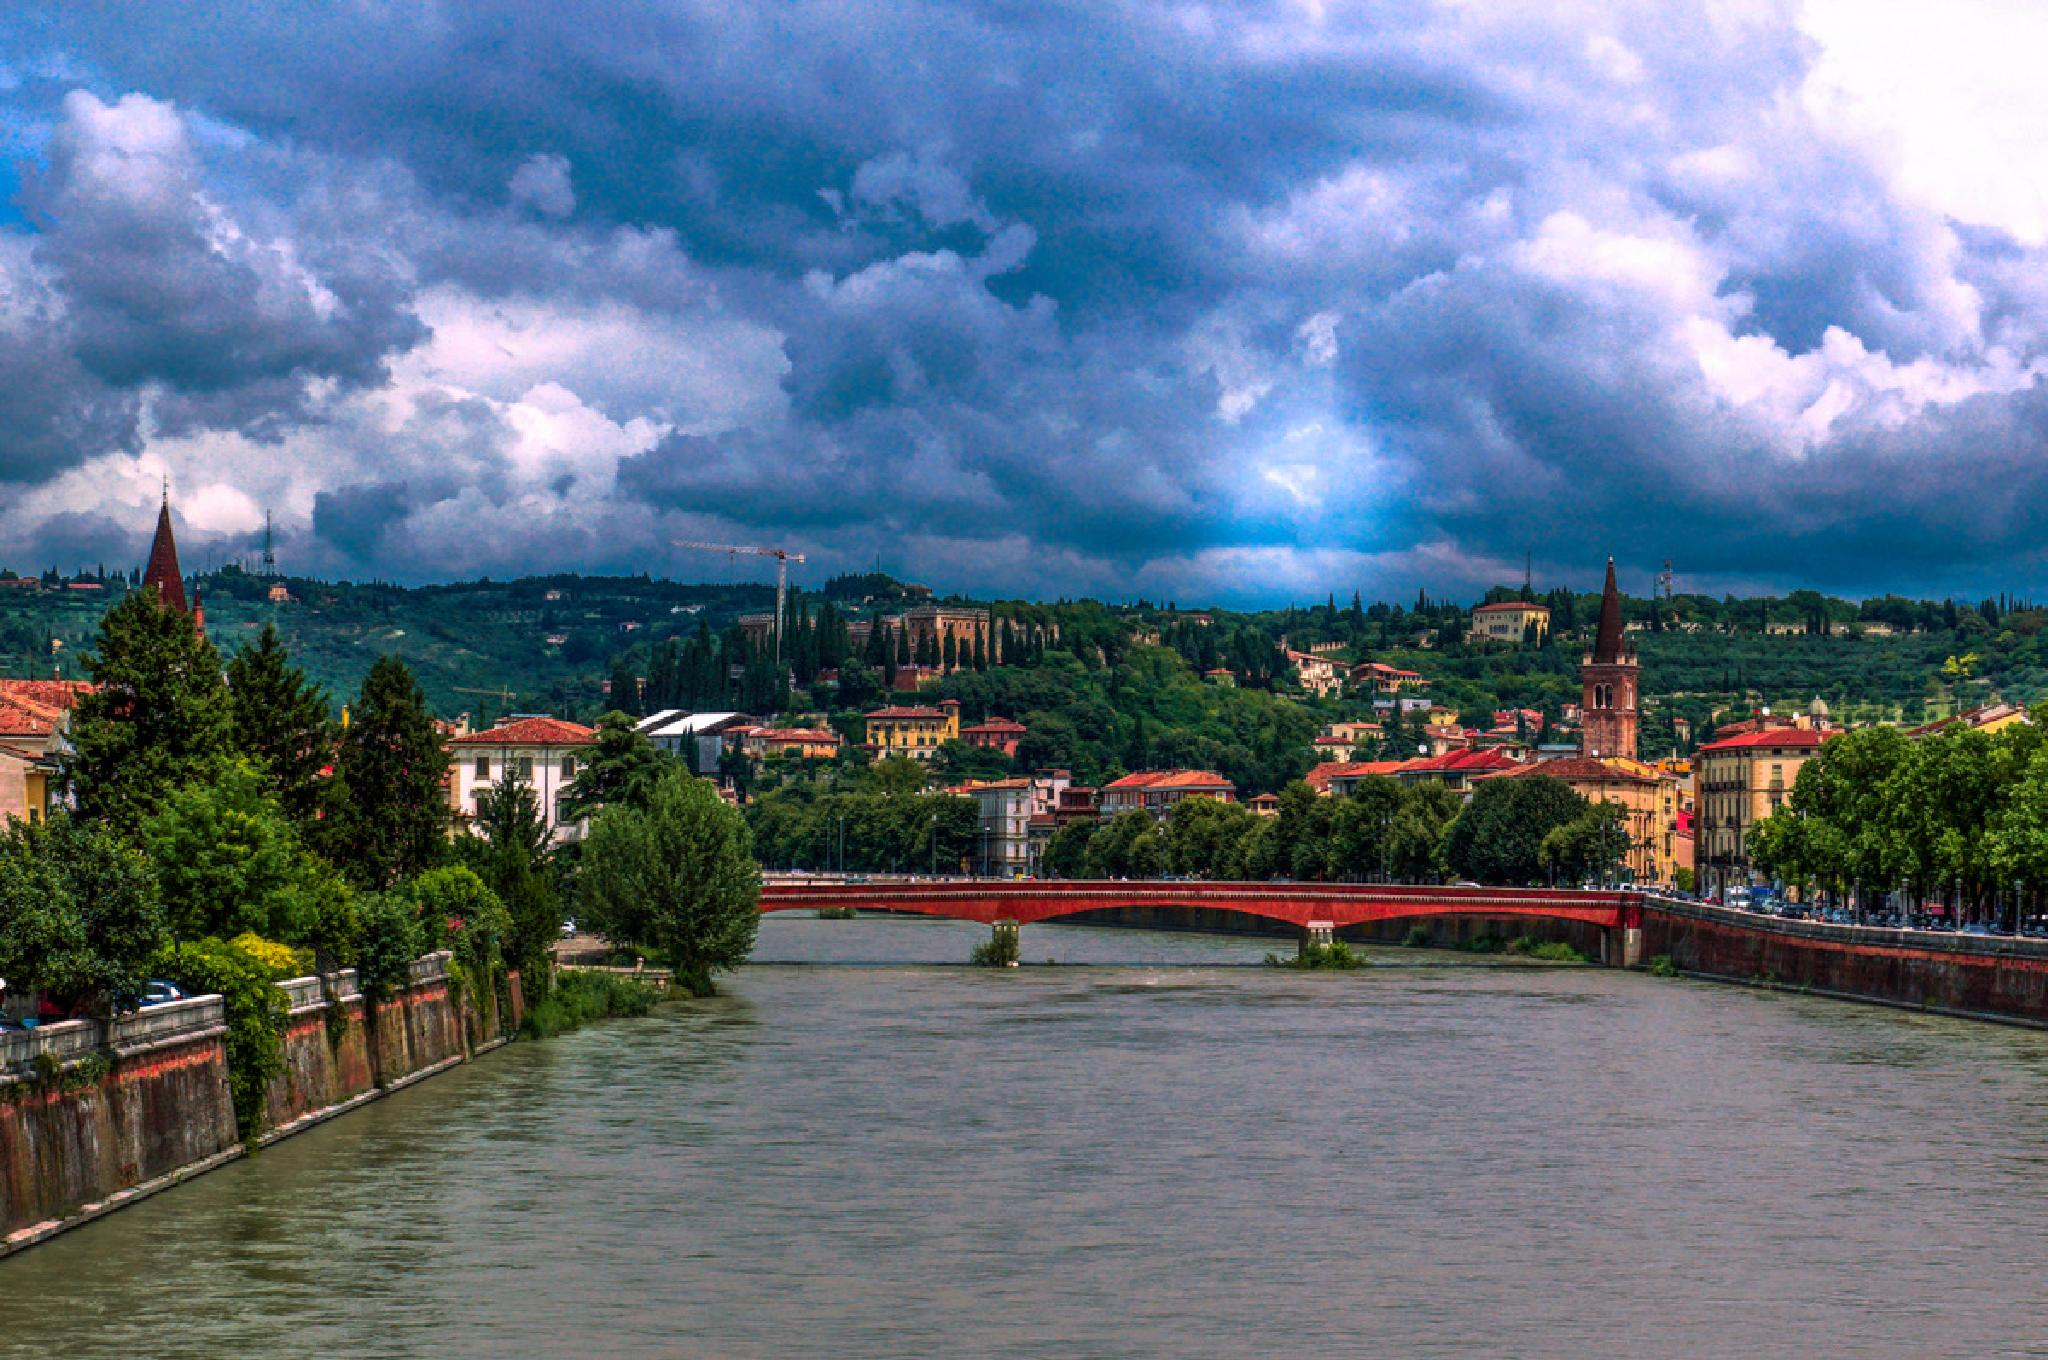 Goodbye to Verona by Jane.lindbladh